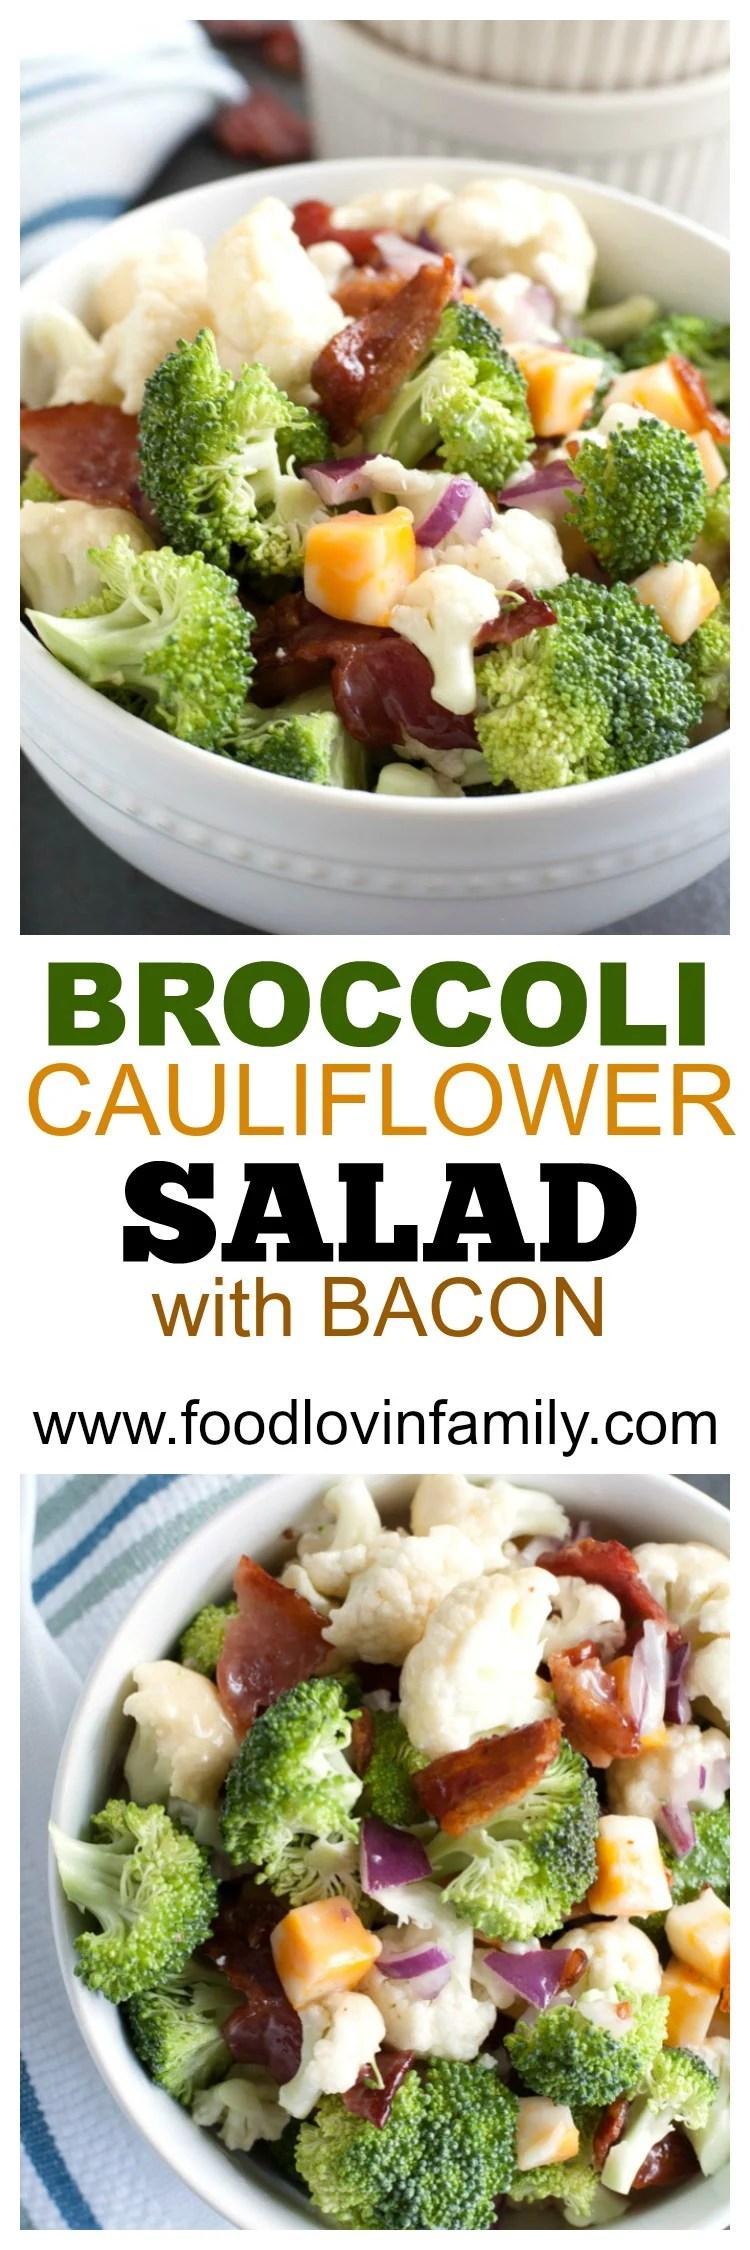 Broccoli and Cauliflower Salad with Bacon PIN